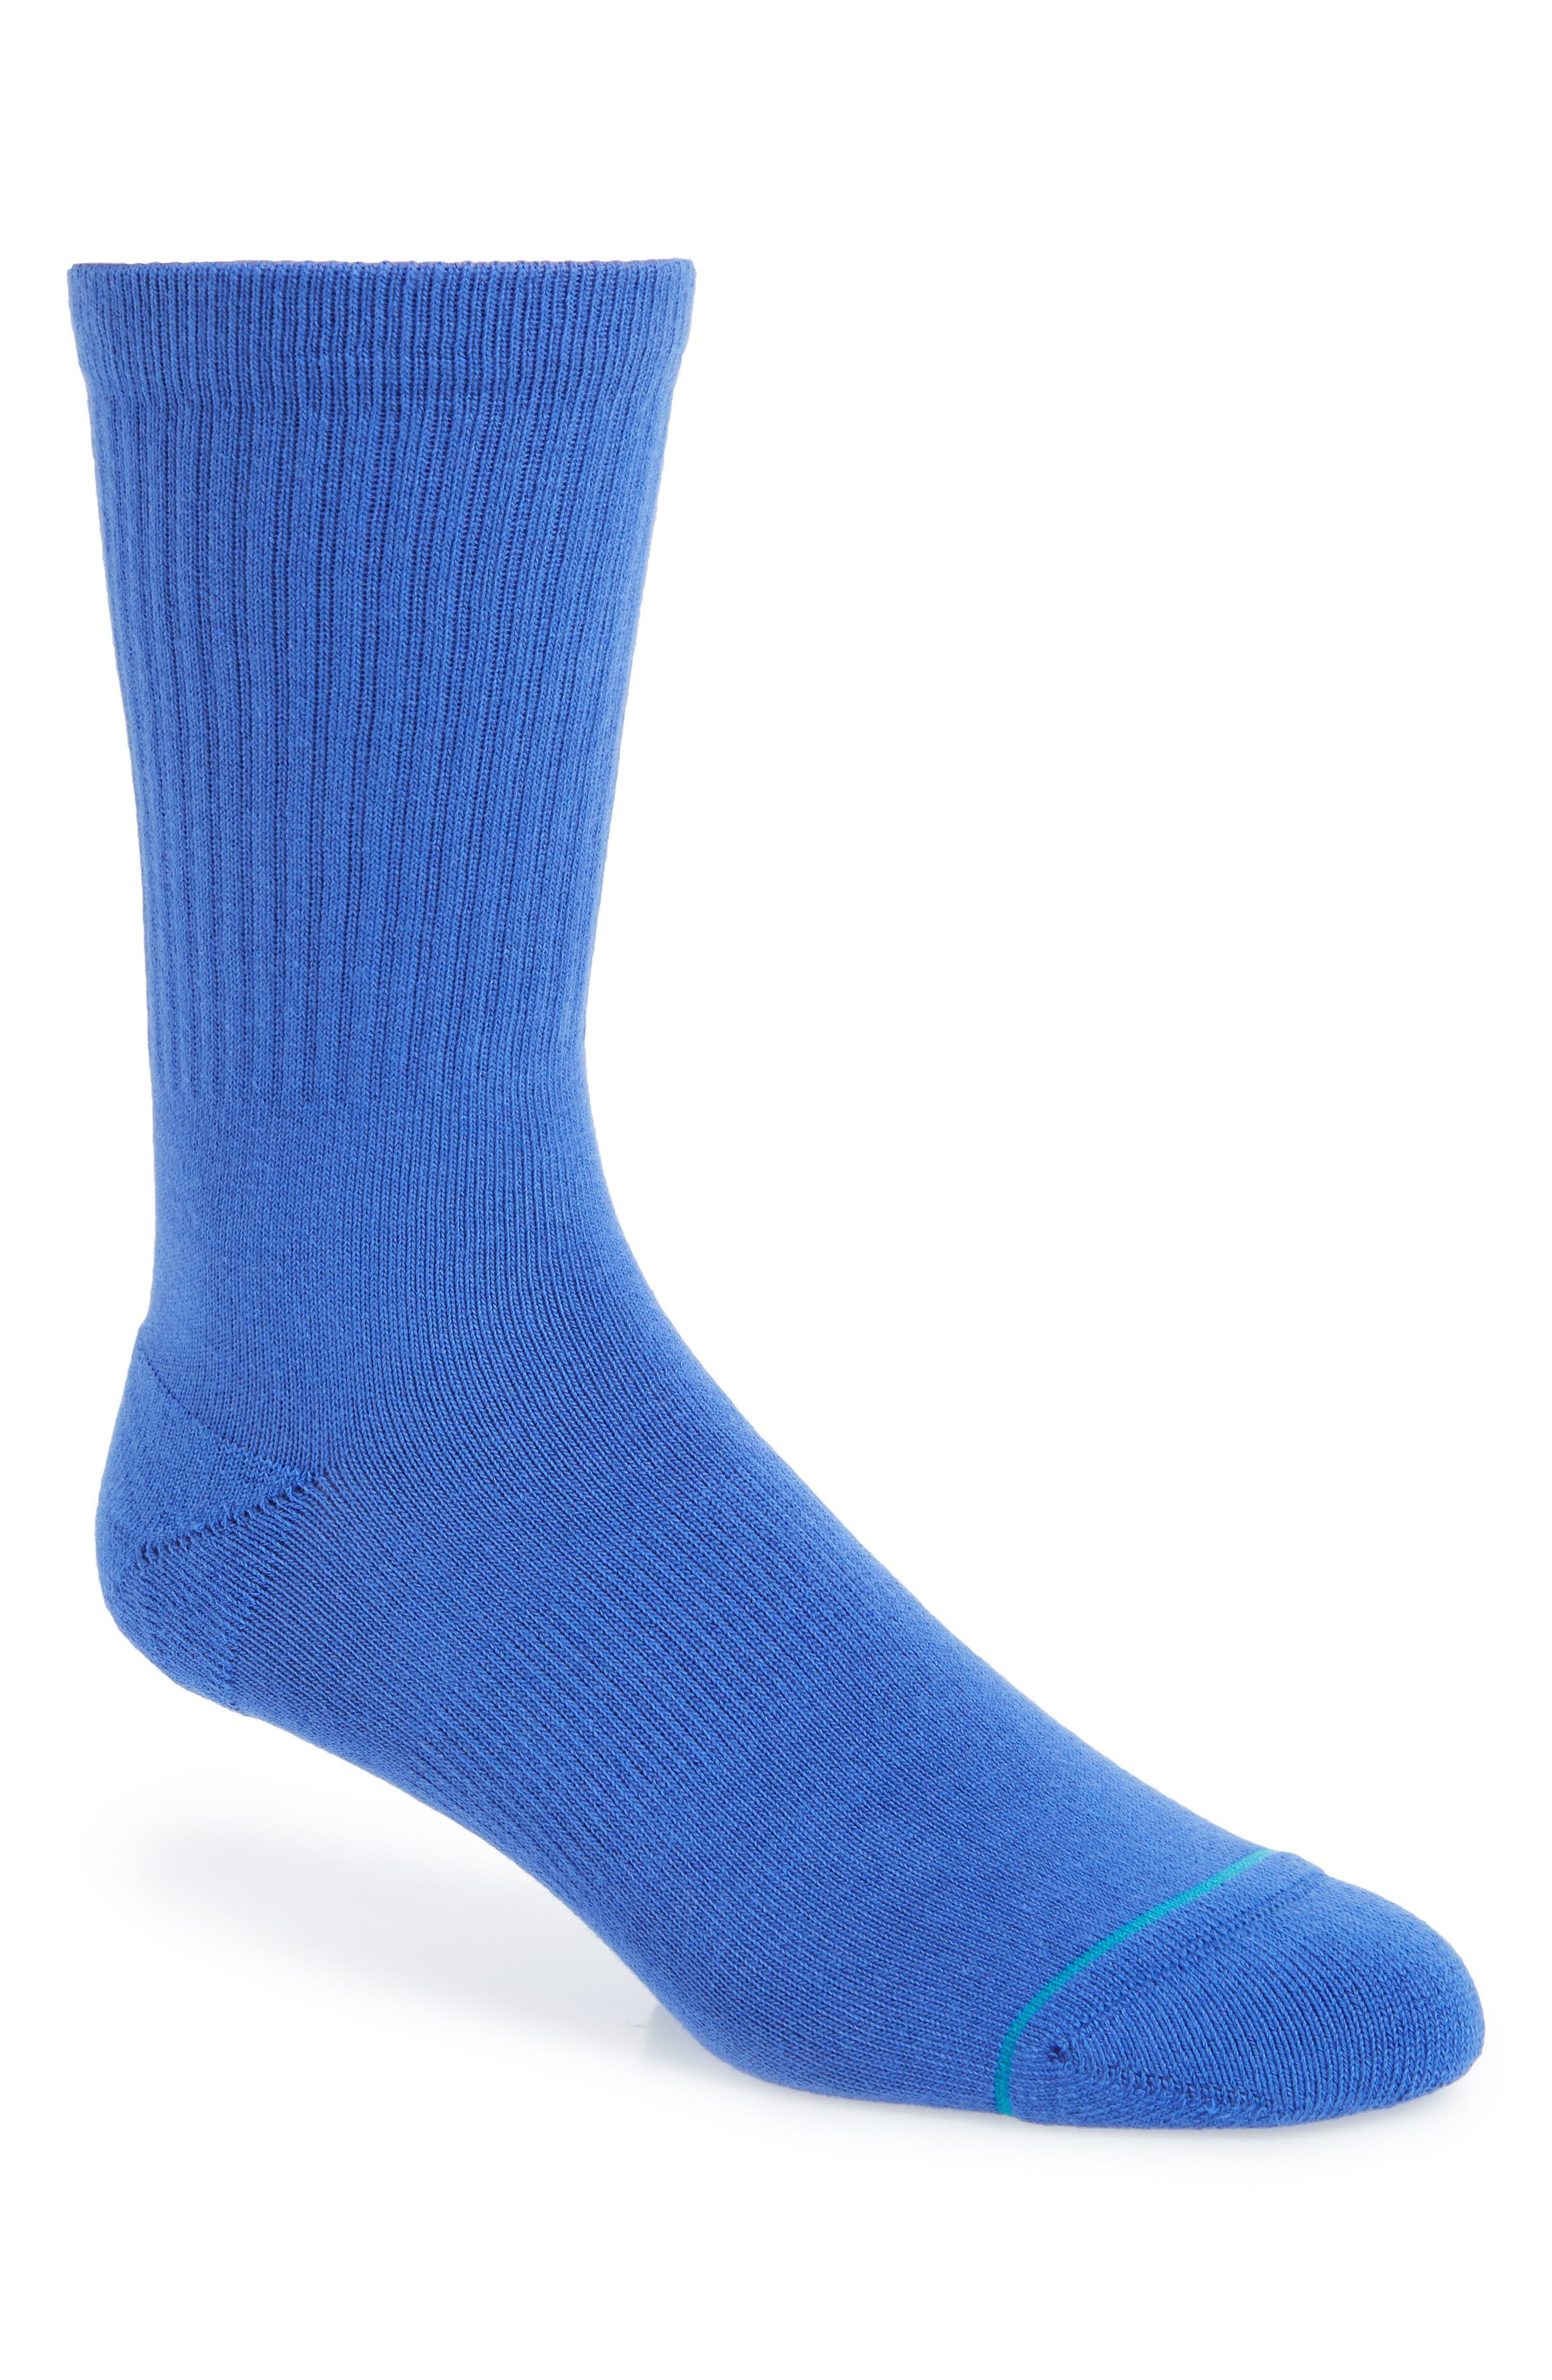 STANCE,                             'Icon' Athletic Socks,                             Main thumbnail 1, color,                             ROYAL